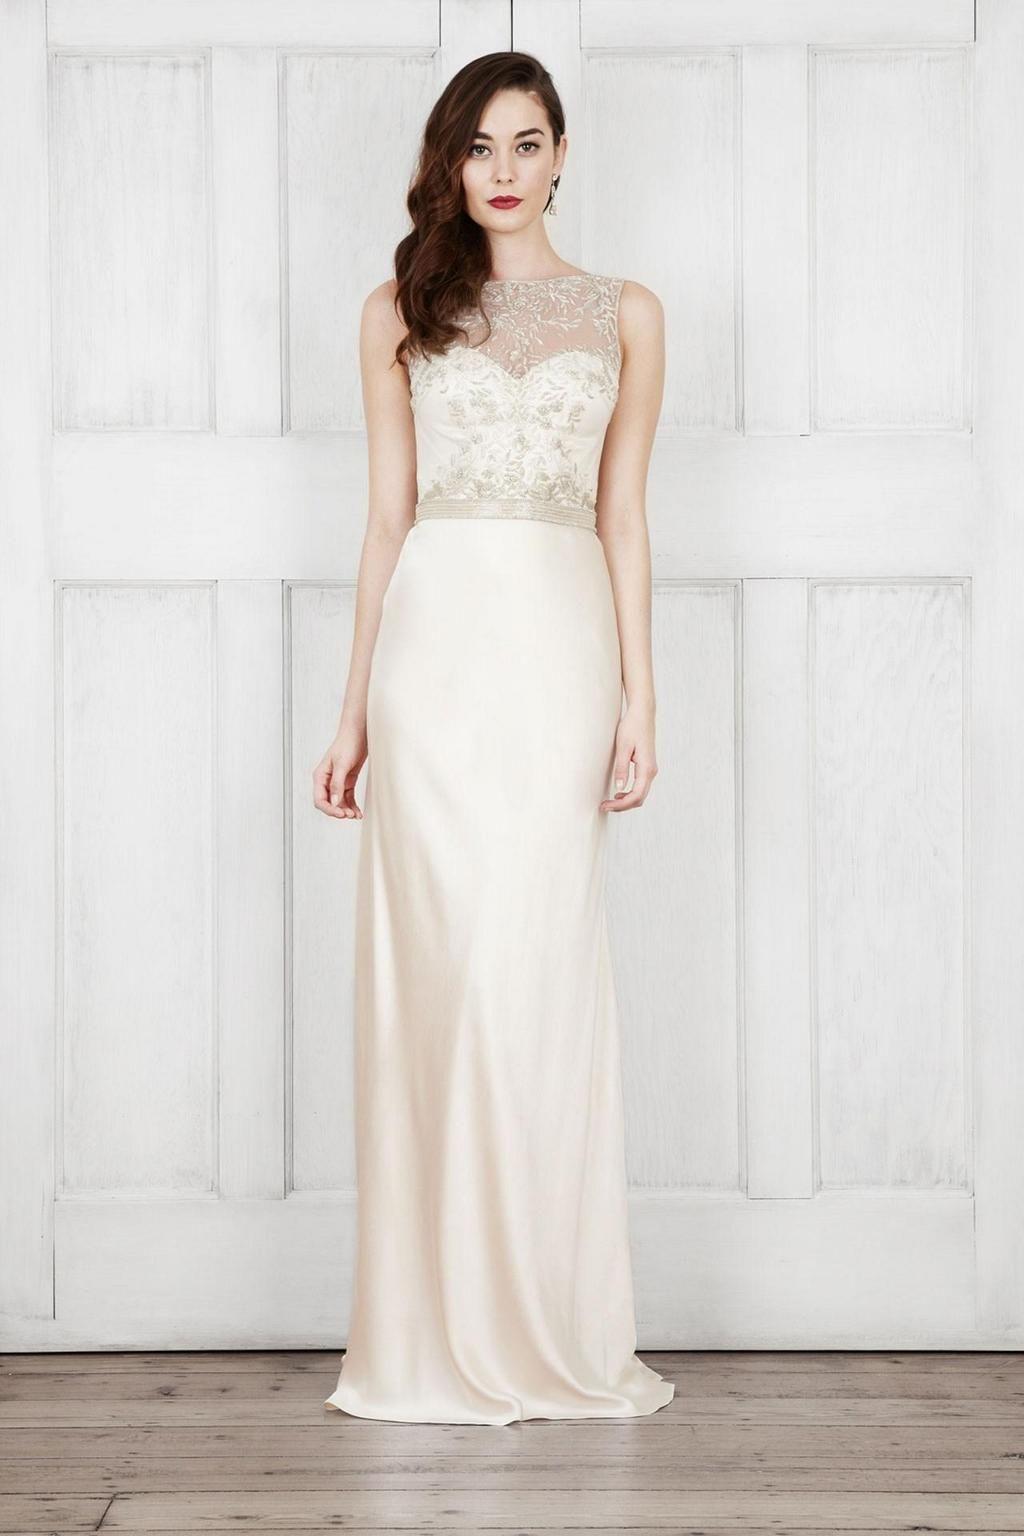 Brides Magazine on | Elegant